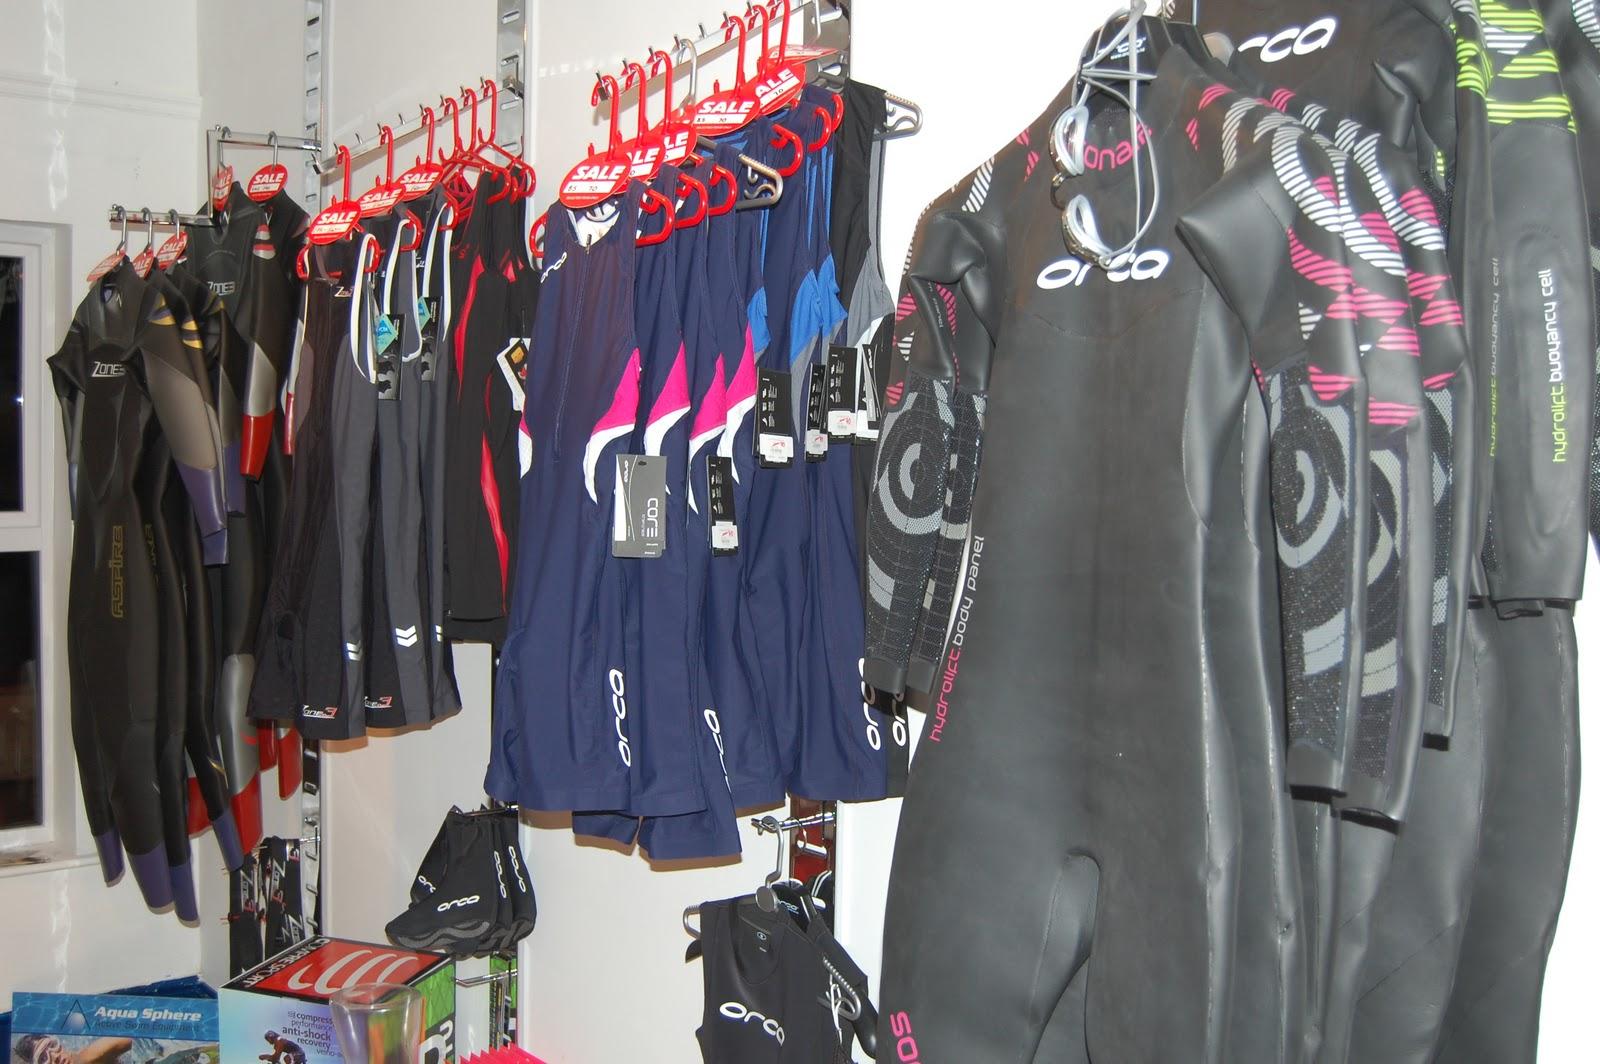 TriRunning – A NEW Triathlon shop opens in Northants